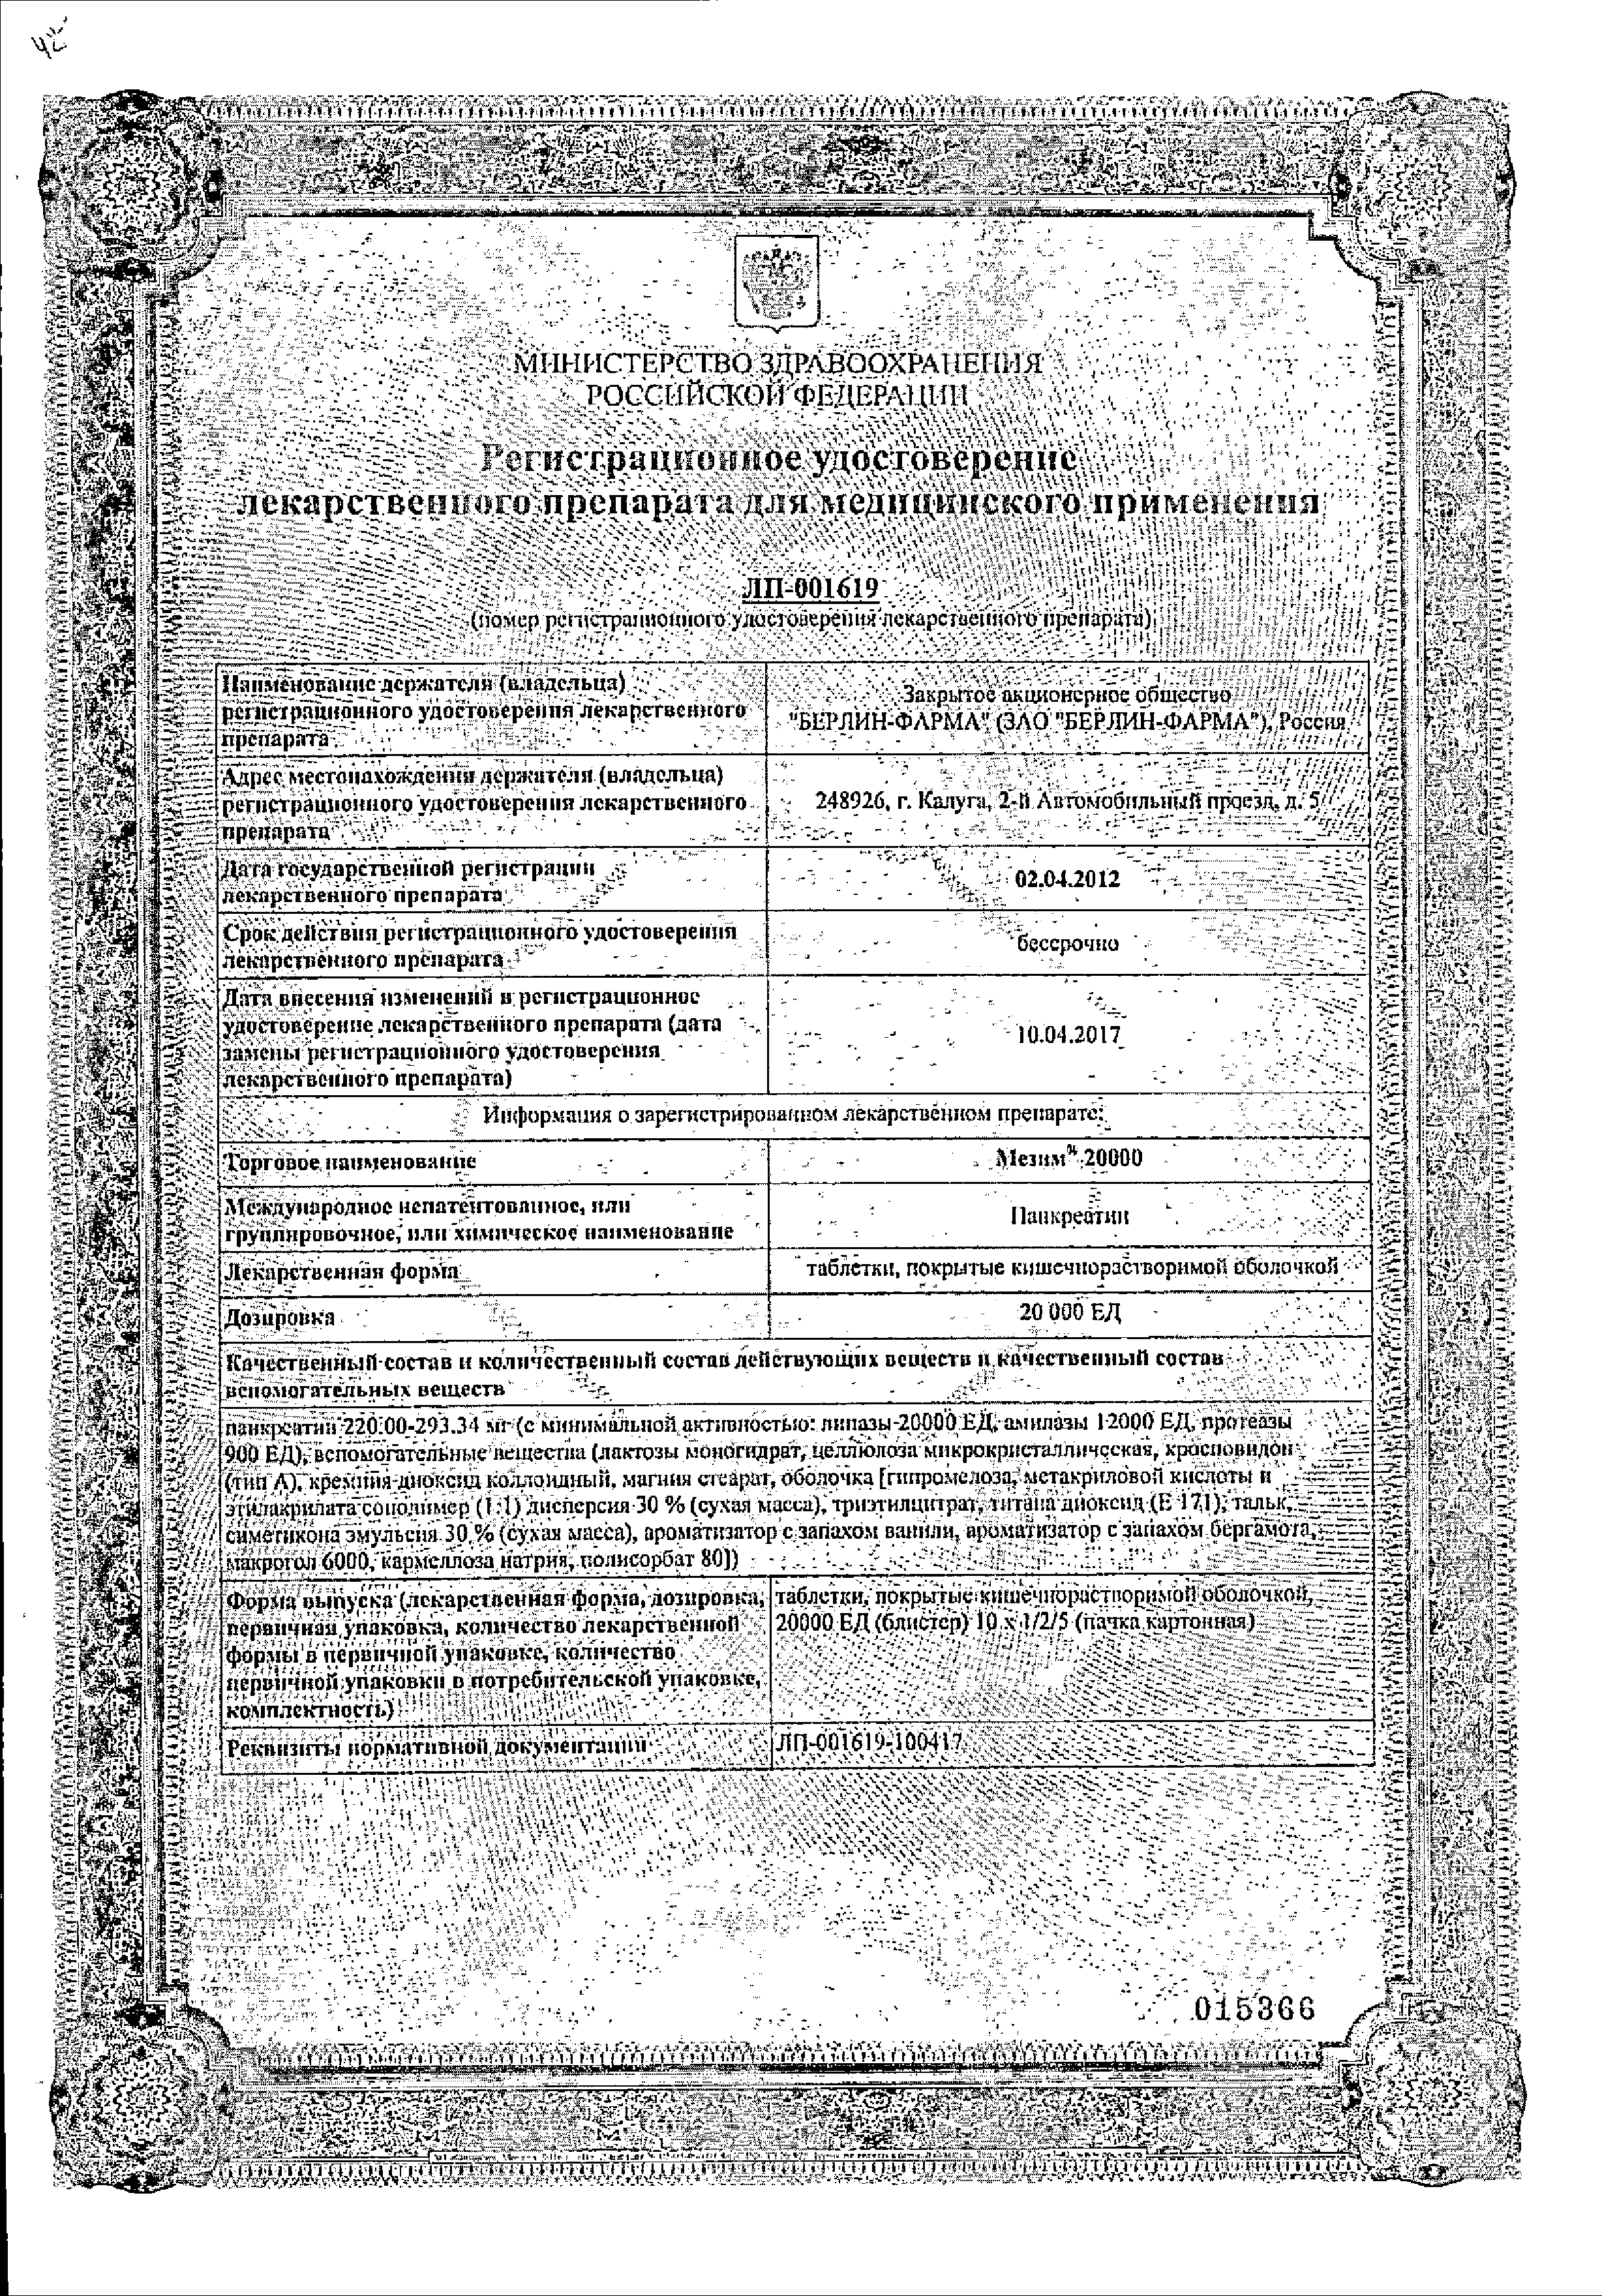 Мезим 20000 сертификат